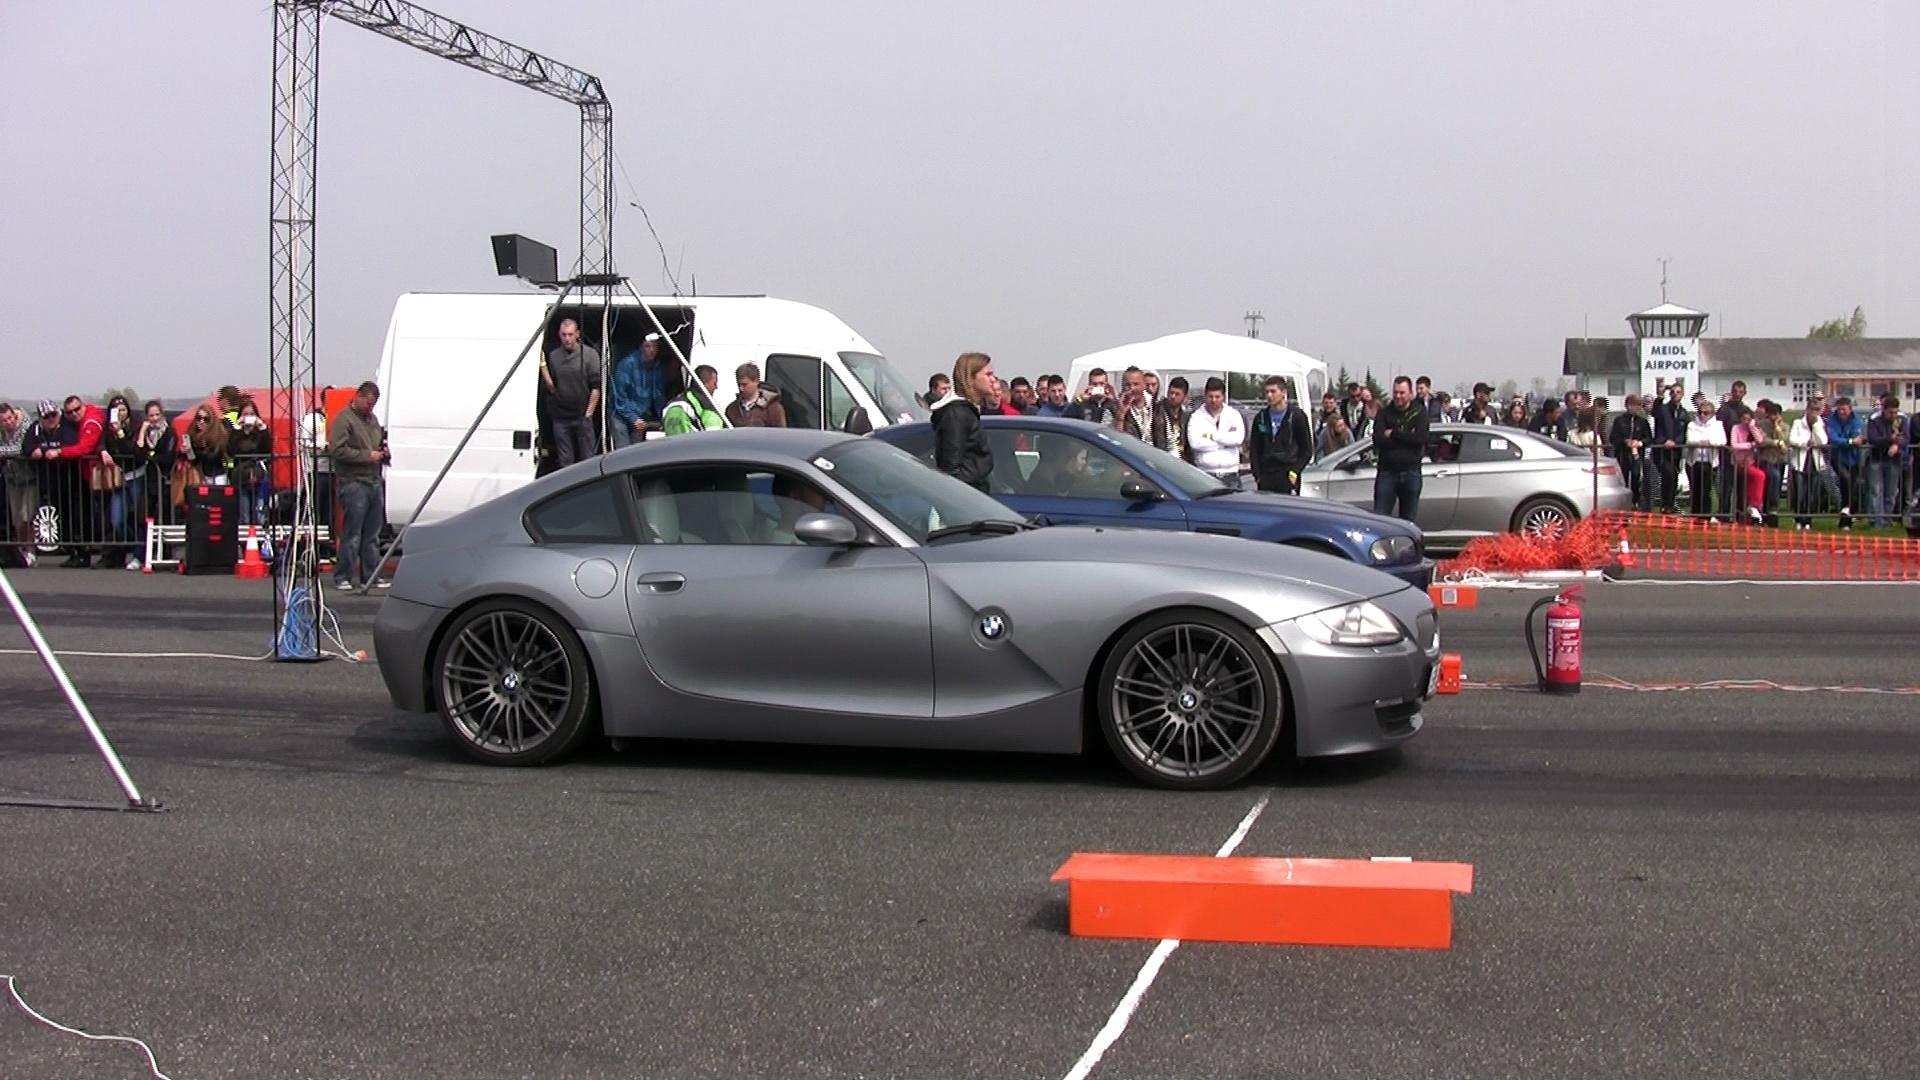 BMW E46 M3 Vs. BMW Z4